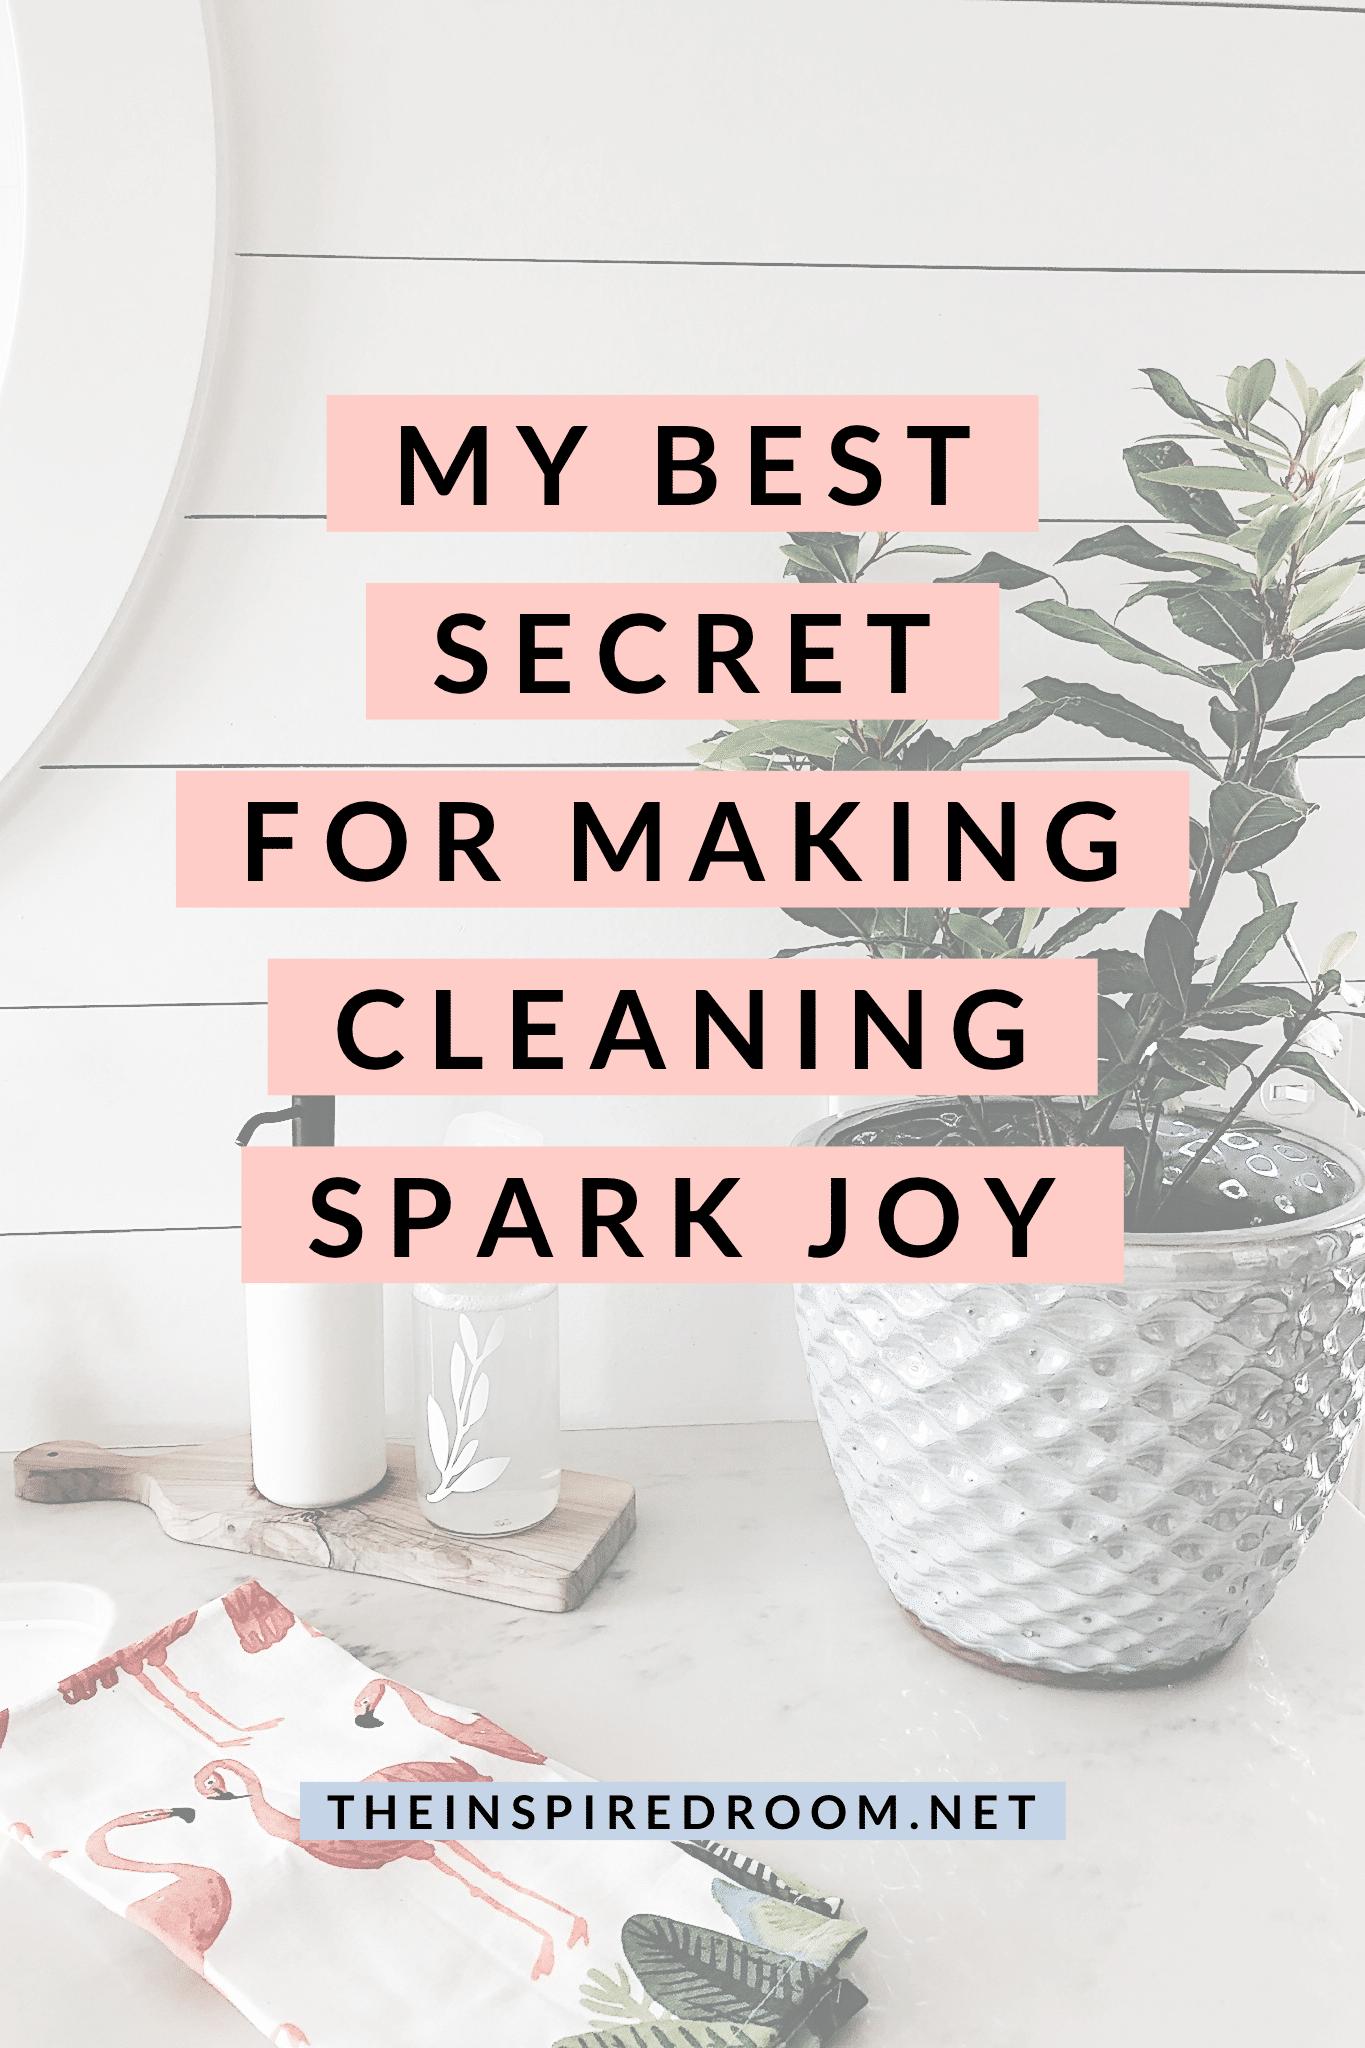 My Best Secret for Making Cleaning Spark Joy